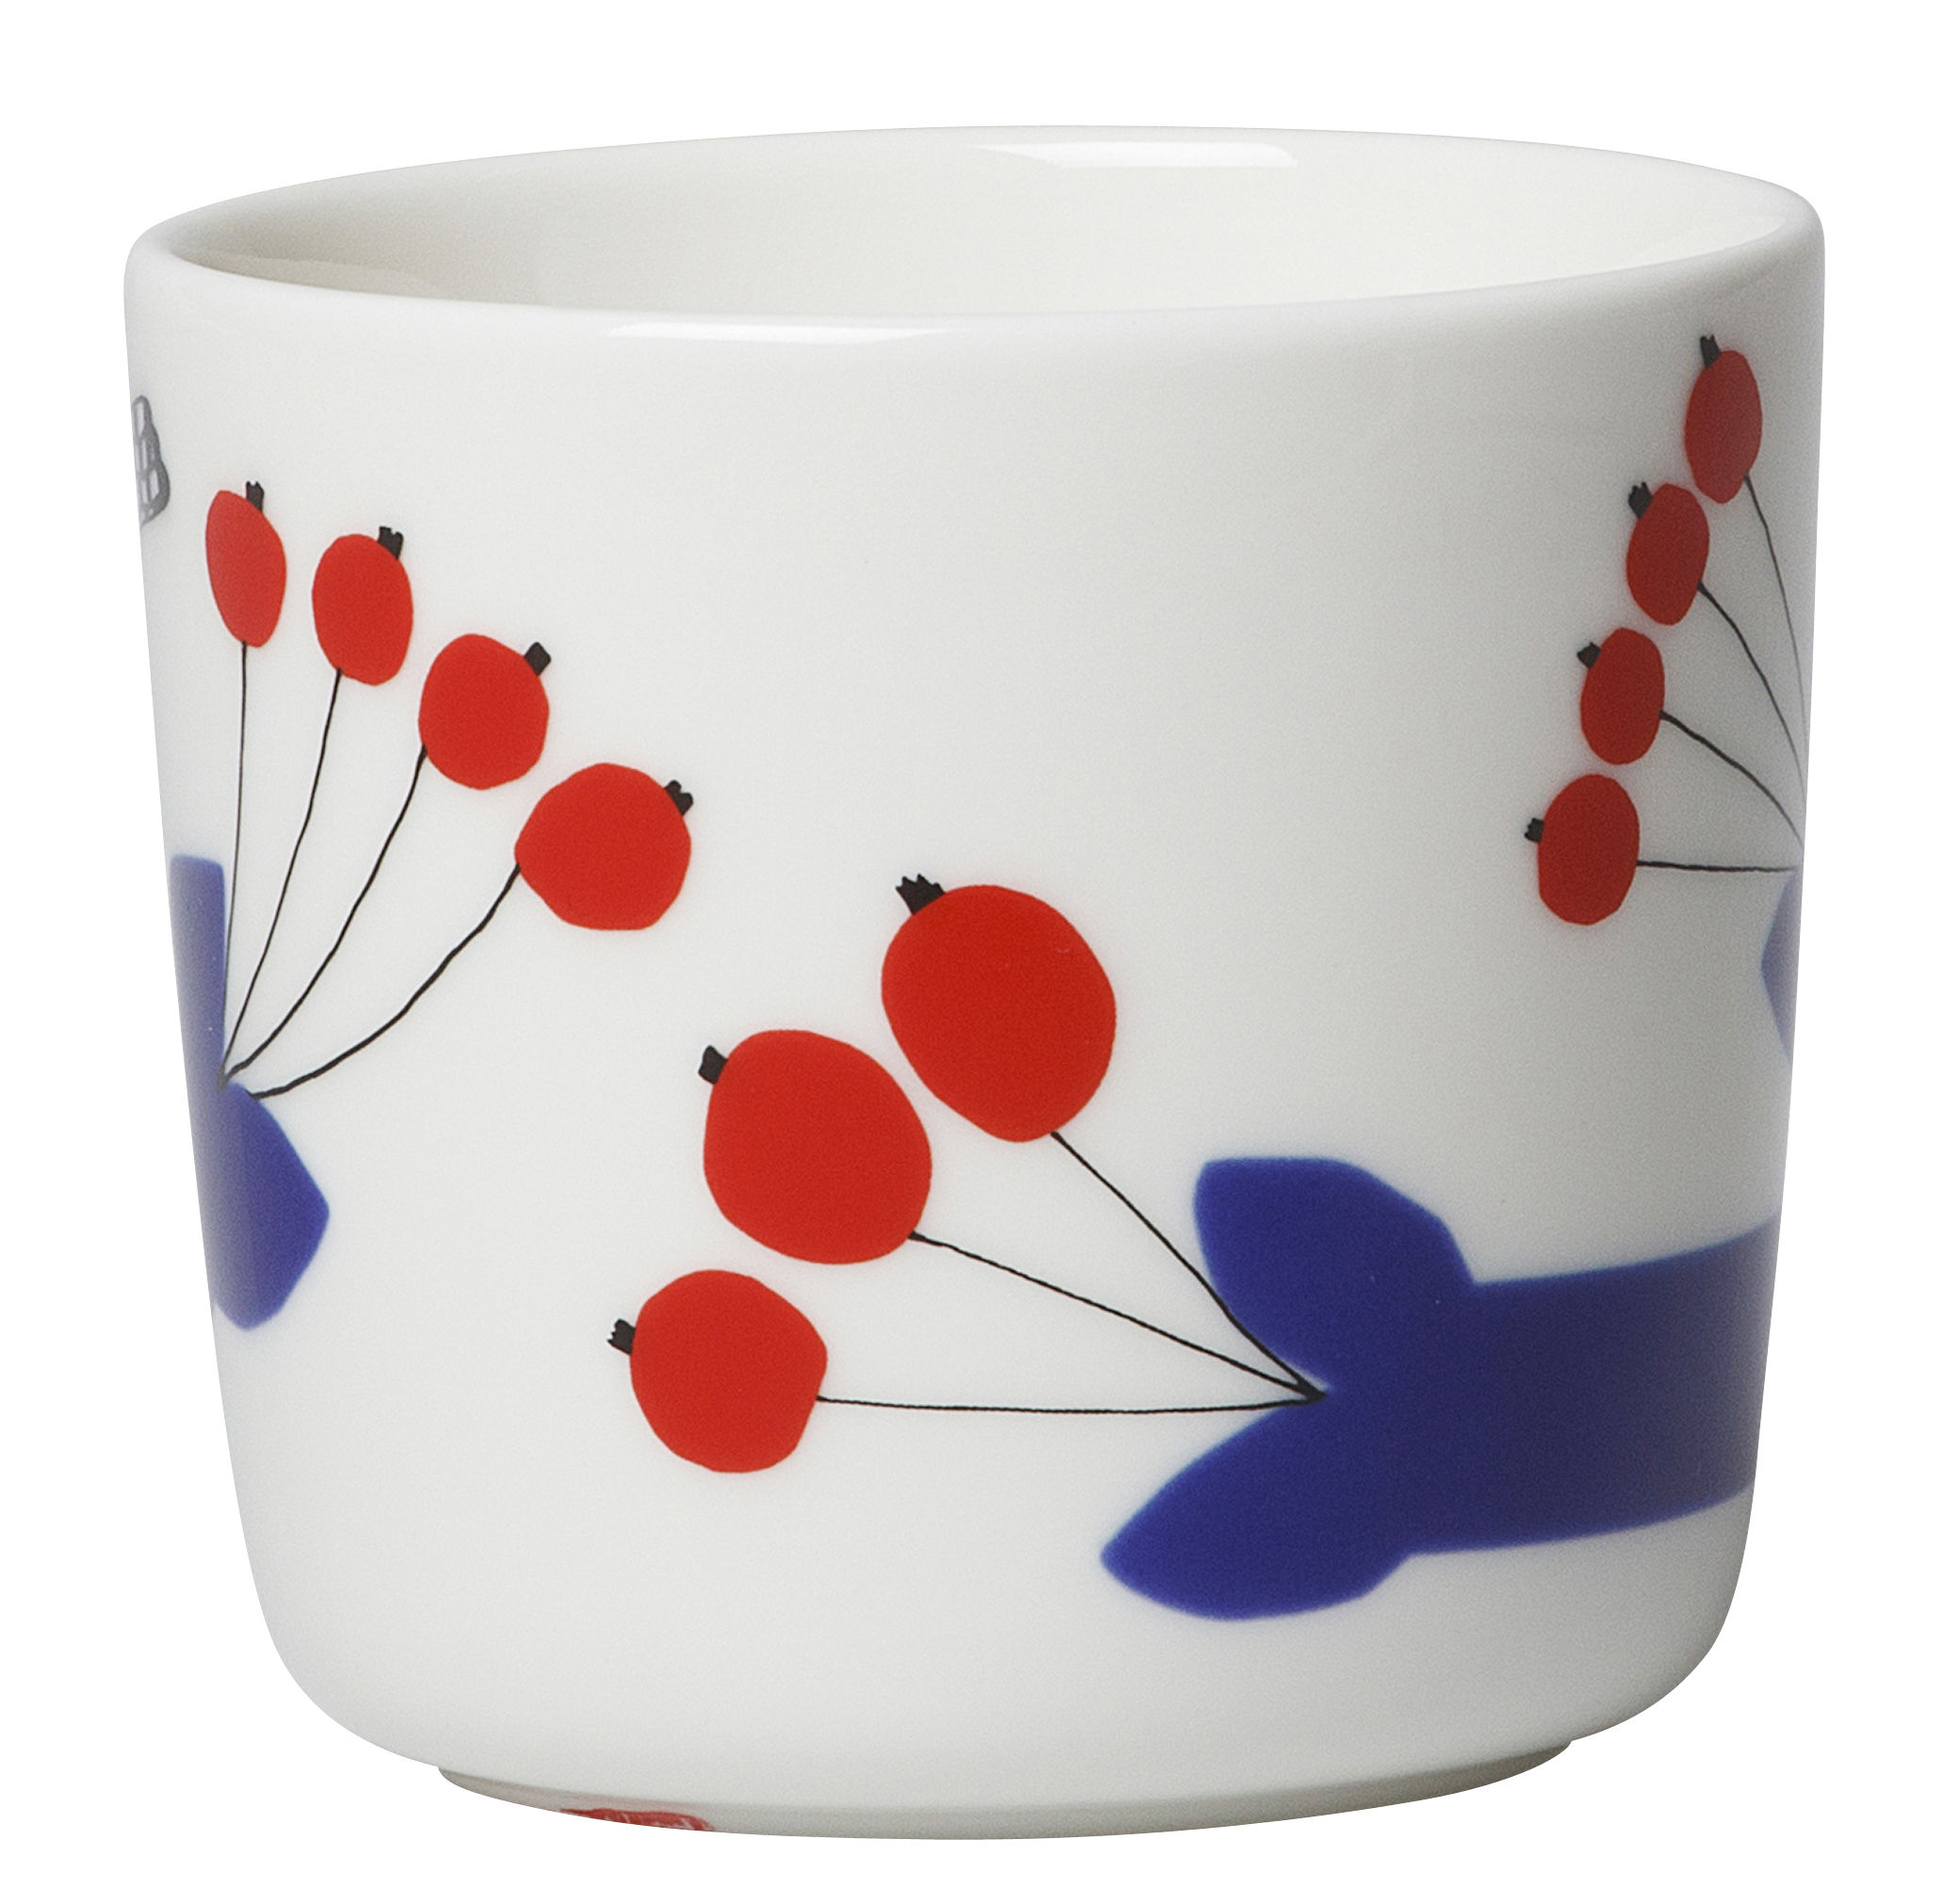 tasse caf pakkanen sans anse set de 2 pakkanen blanc bleu et rouge marimekko. Black Bedroom Furniture Sets. Home Design Ideas